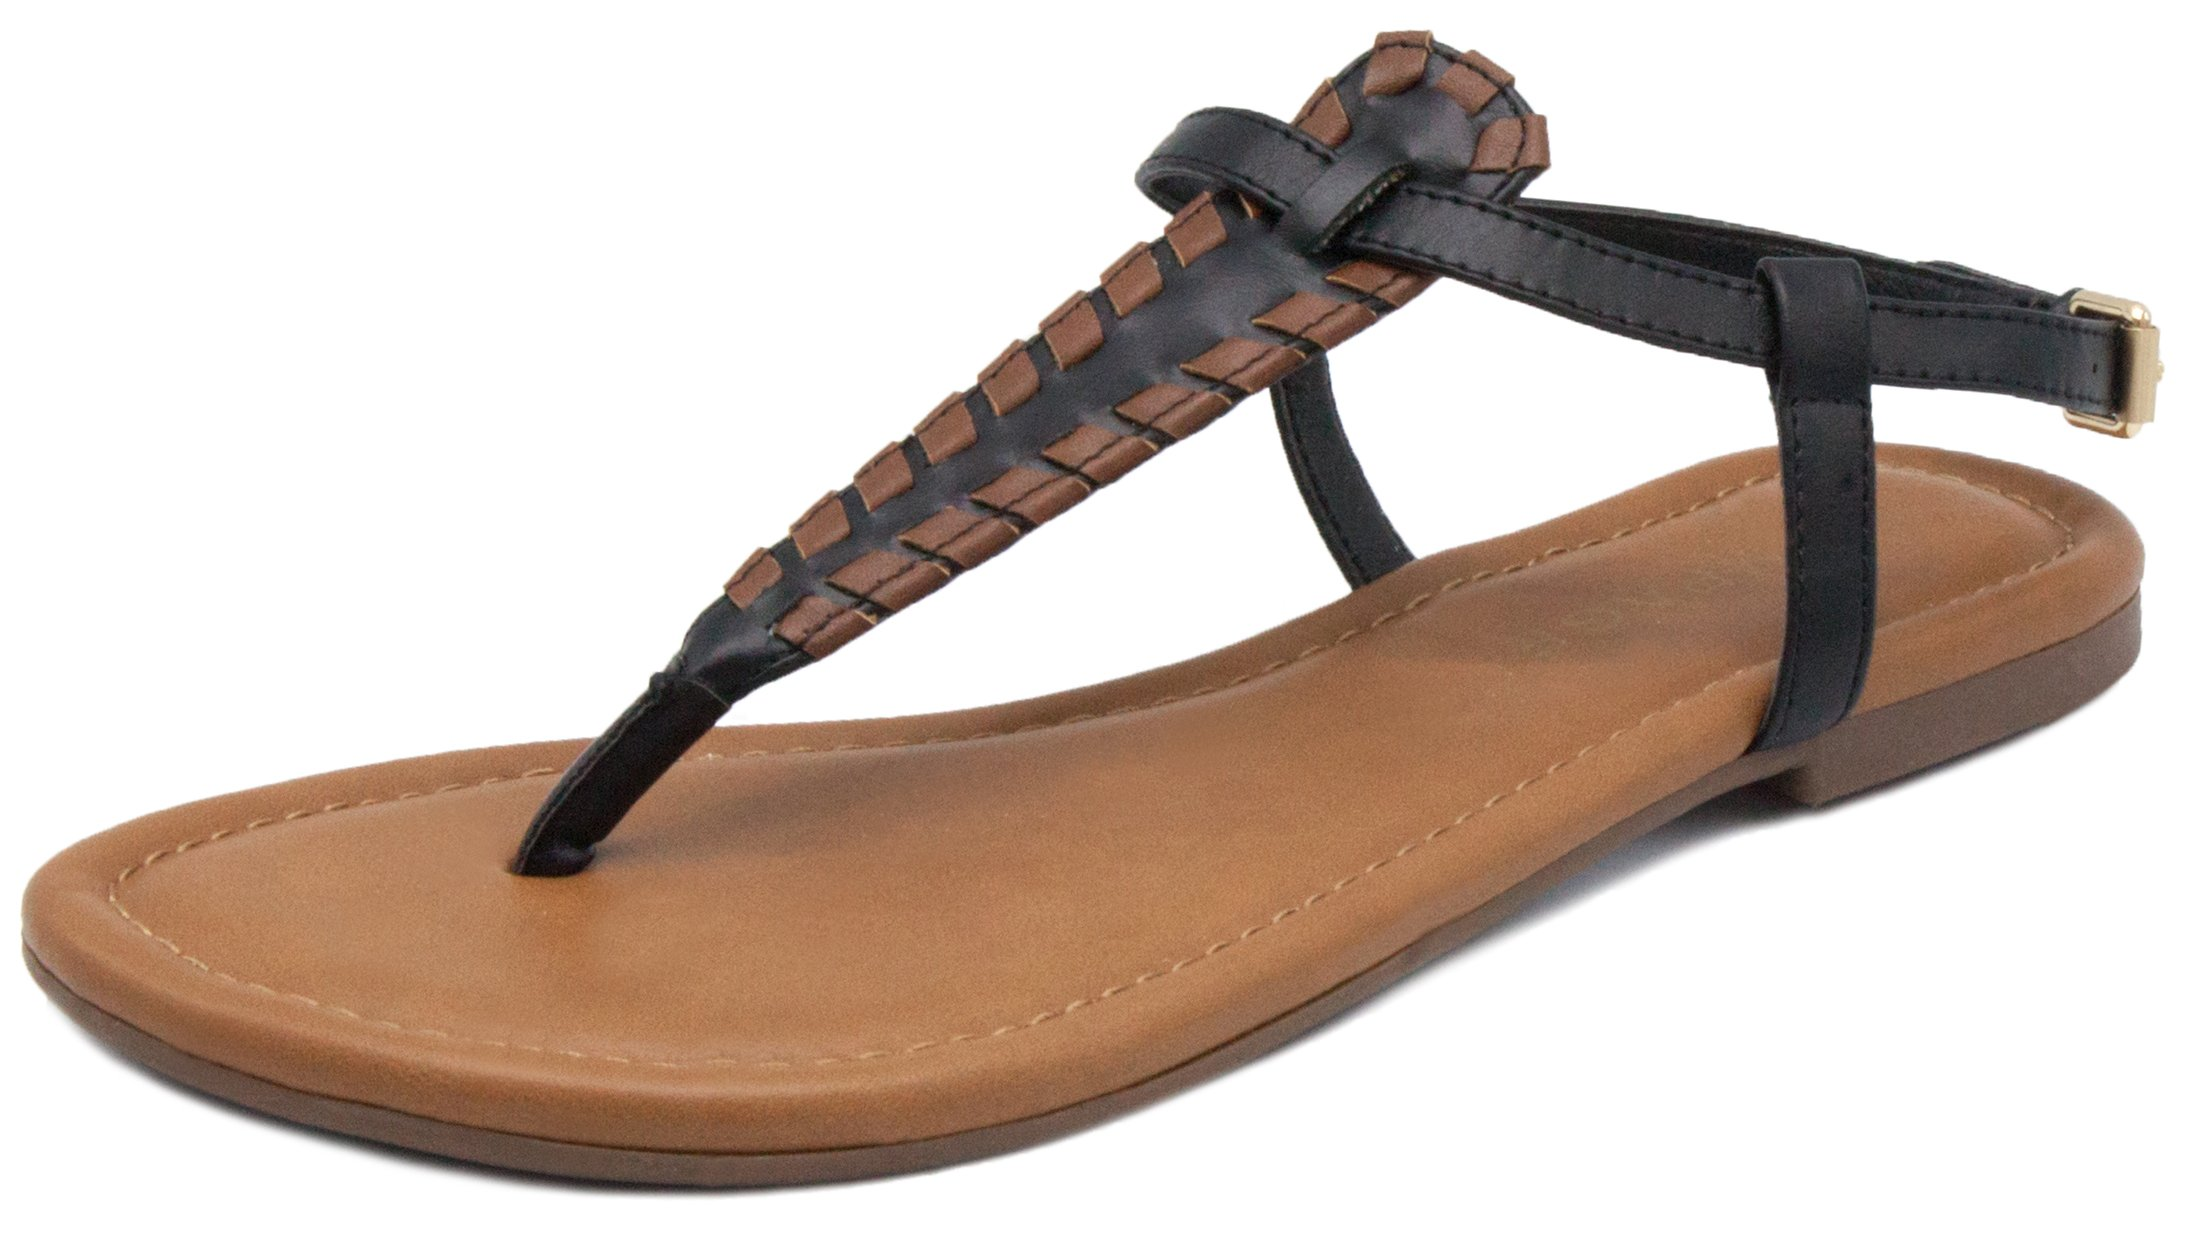 Rampage Women's Pashmina Flat Sandal Black Cognac Whipstitch 10